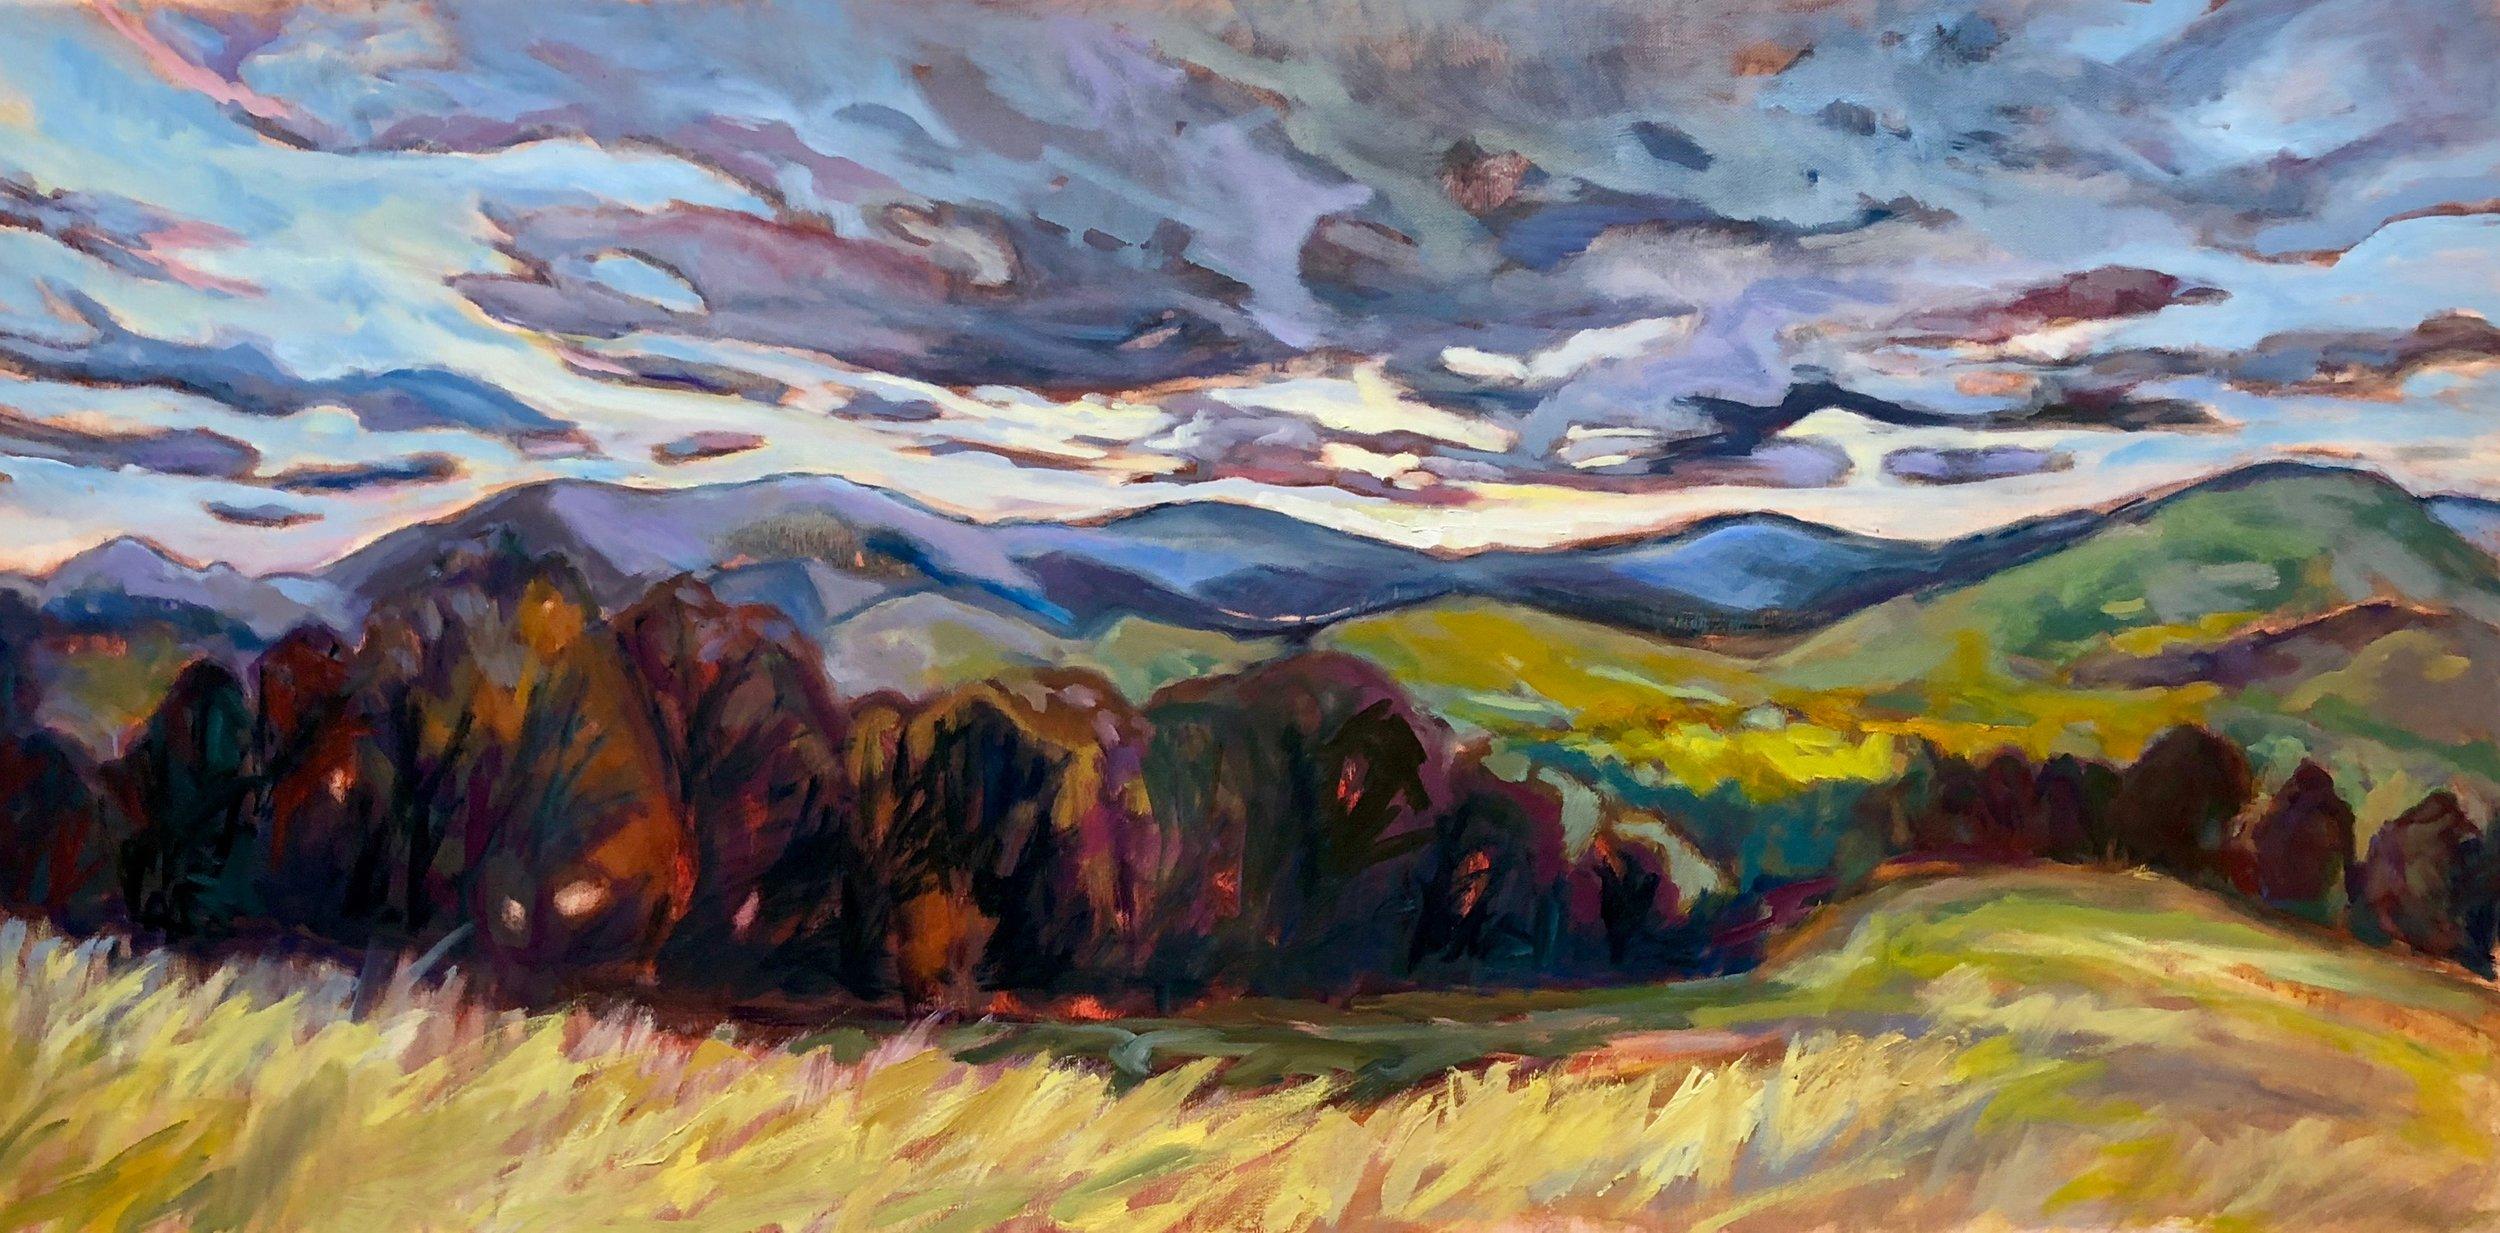 "Clear Skies Ahead, 24"" x 48"", Oil on Canvas"